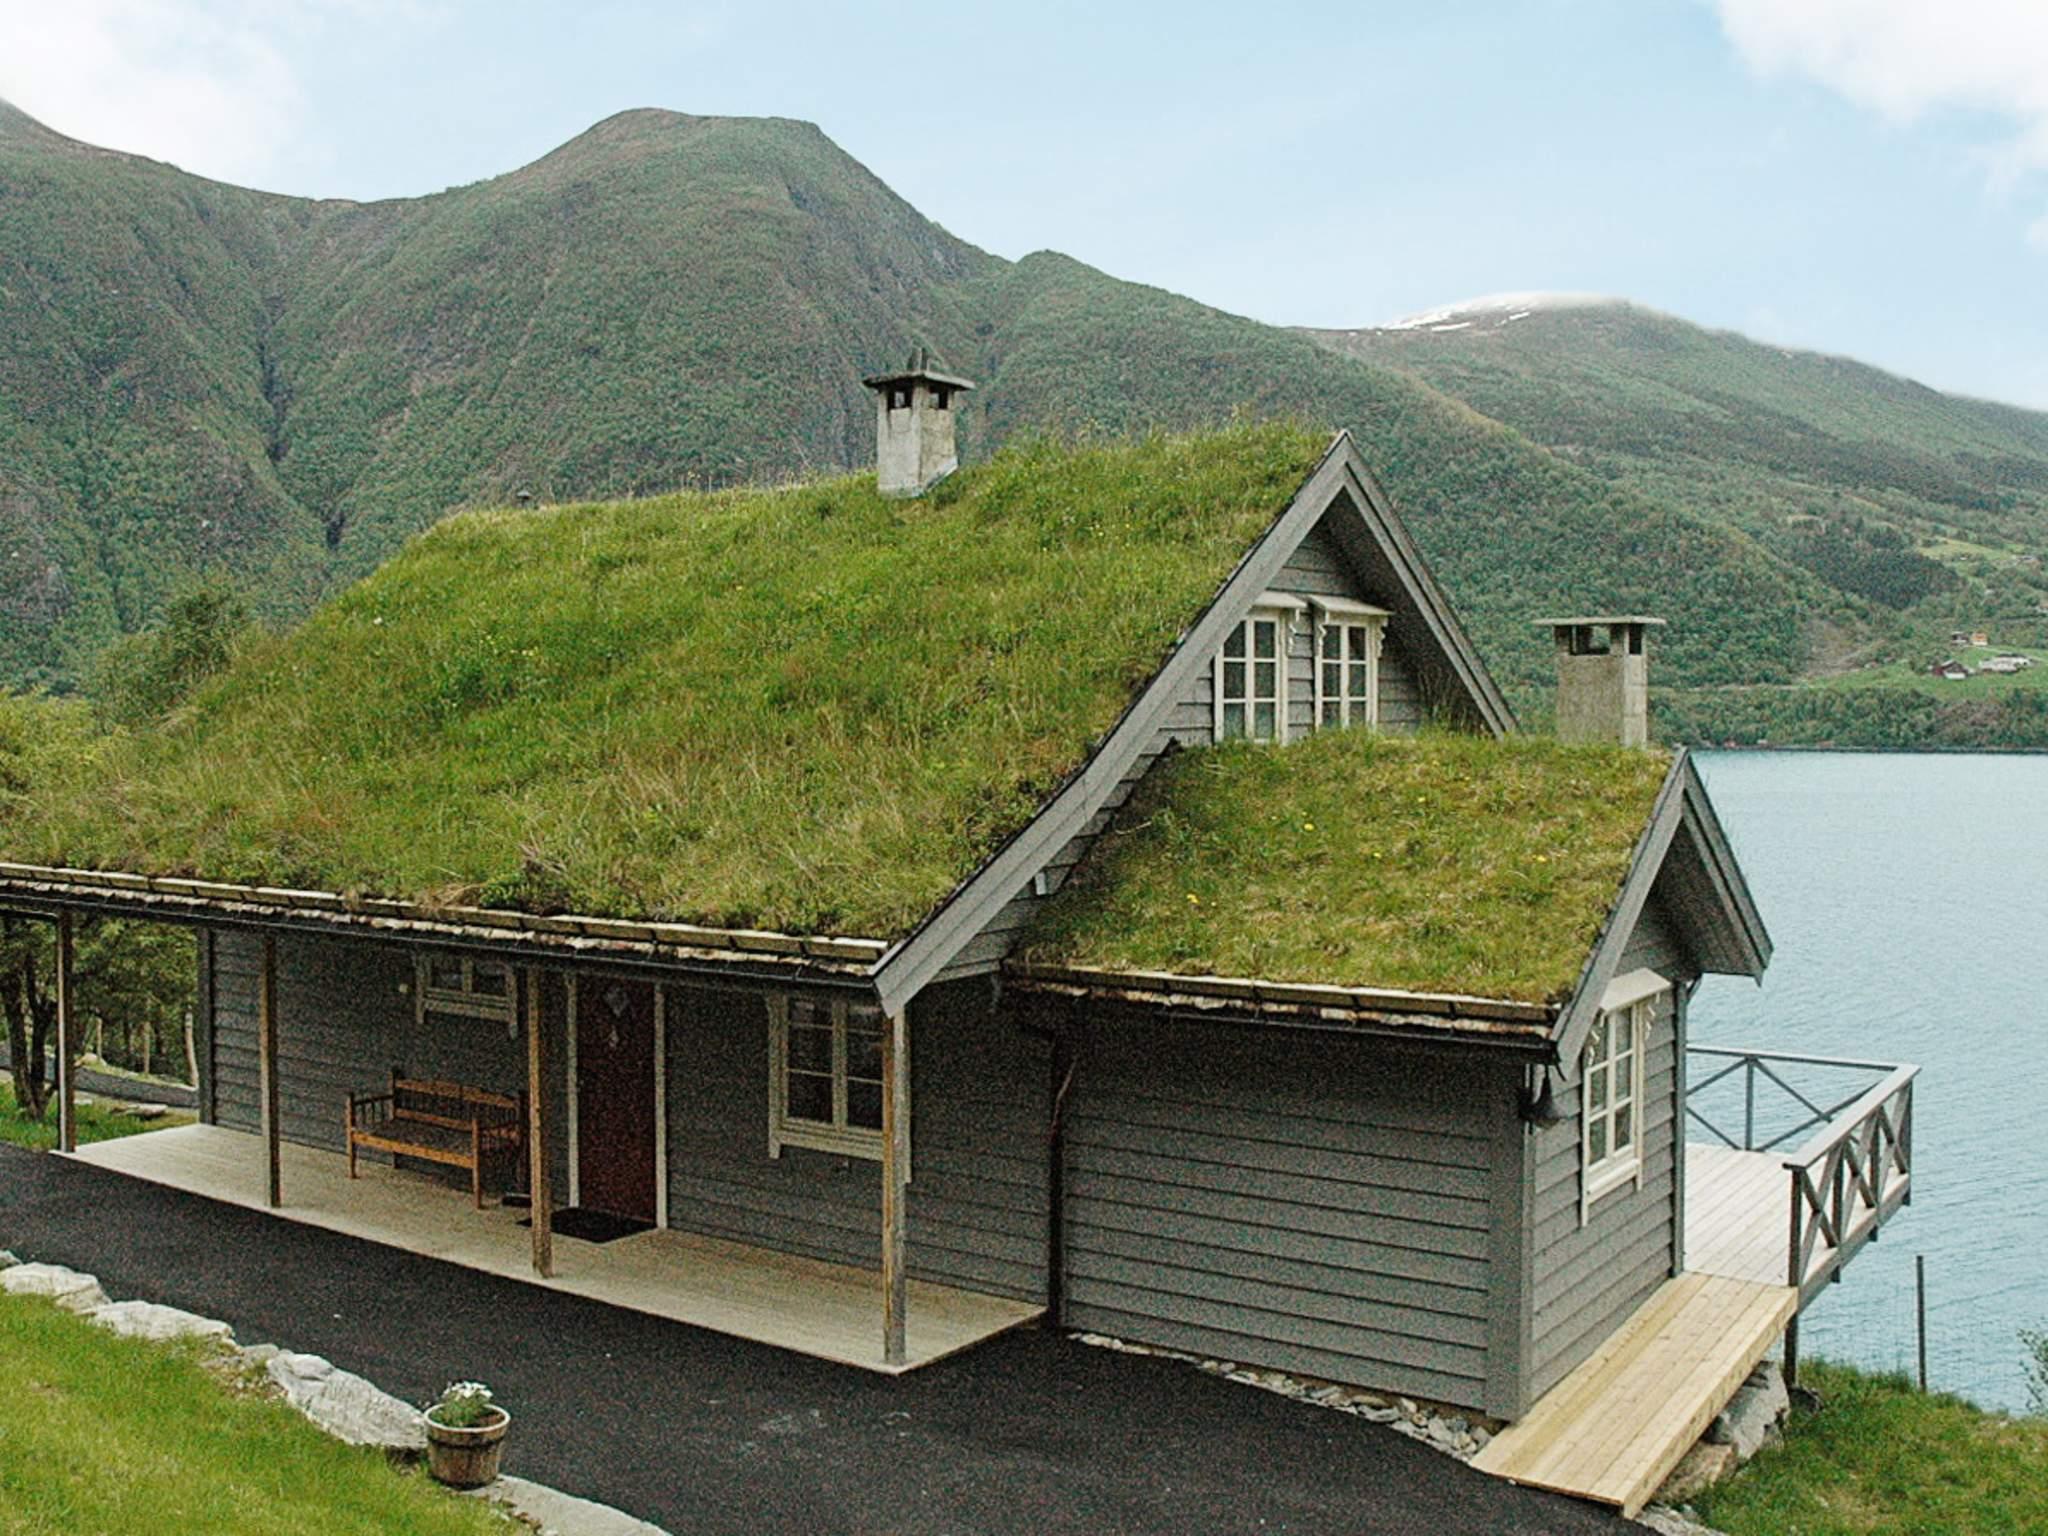 Ferienhaus Innselsetbygda (1043168), Lauvstad, More - Romsdal, Westnorwegen, Norwegen, Bild 21